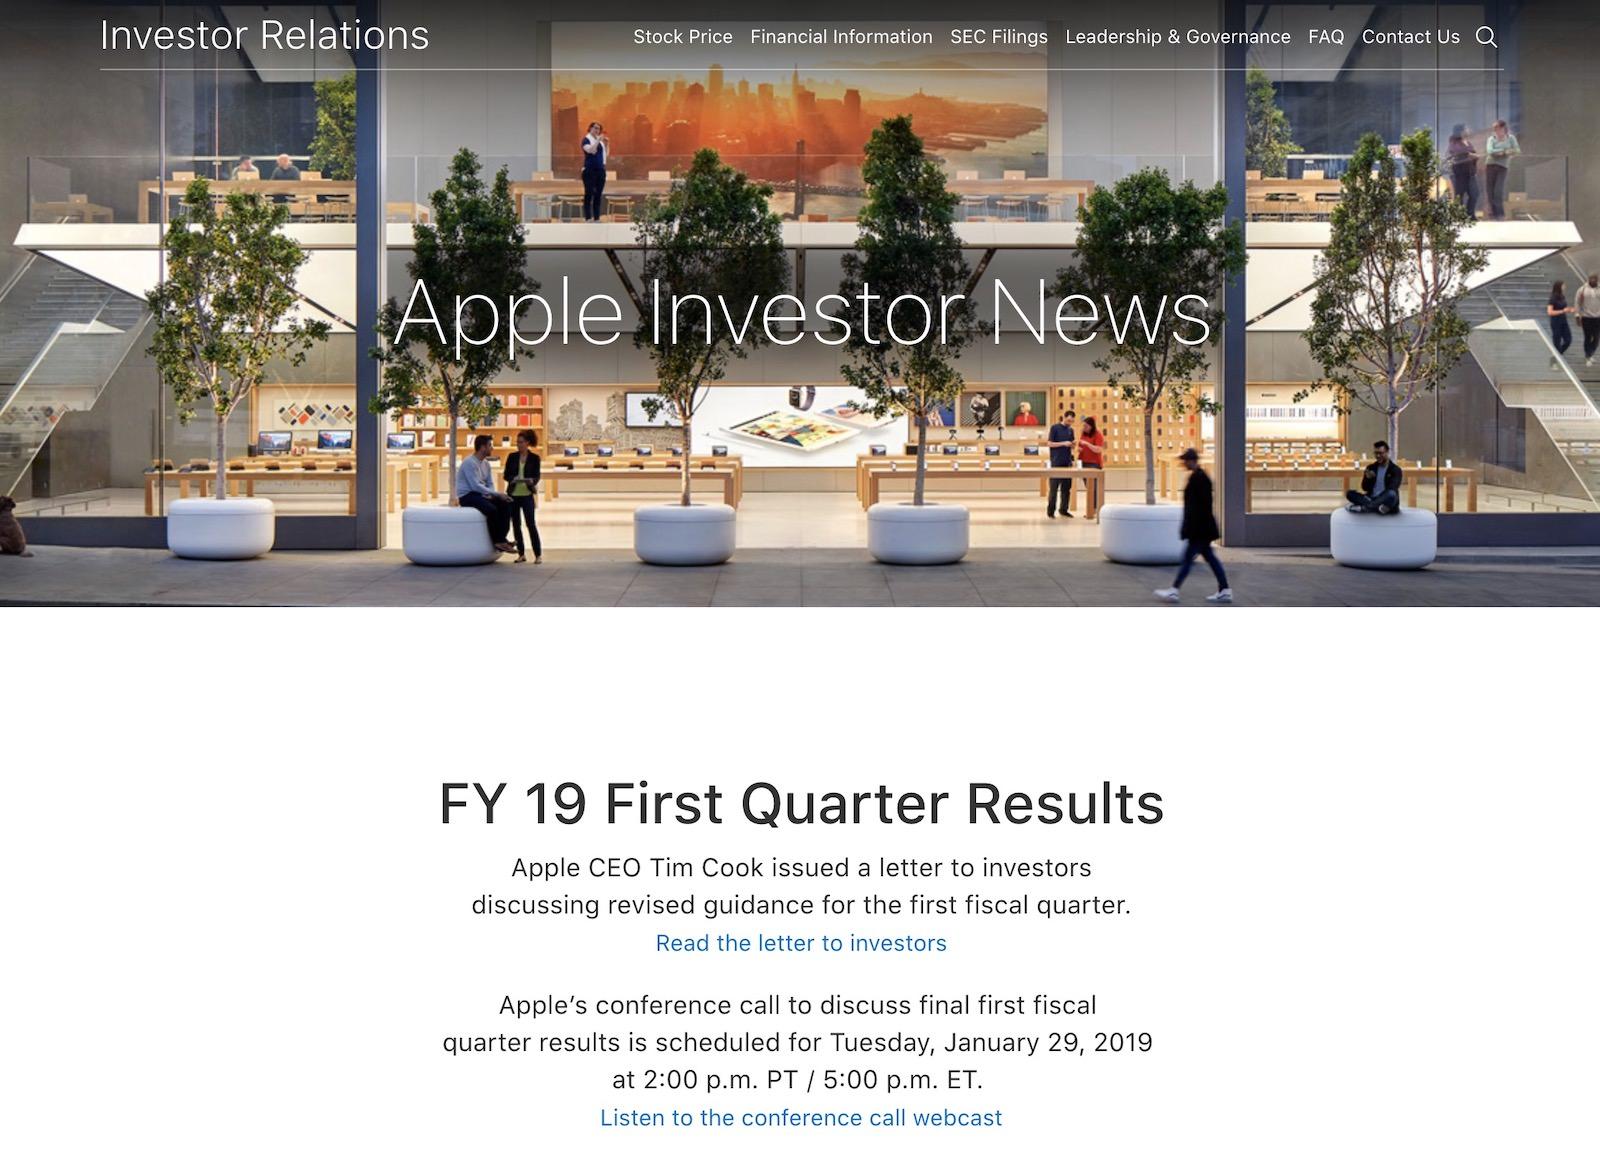 Apple investor news 2019fy19 first quarter